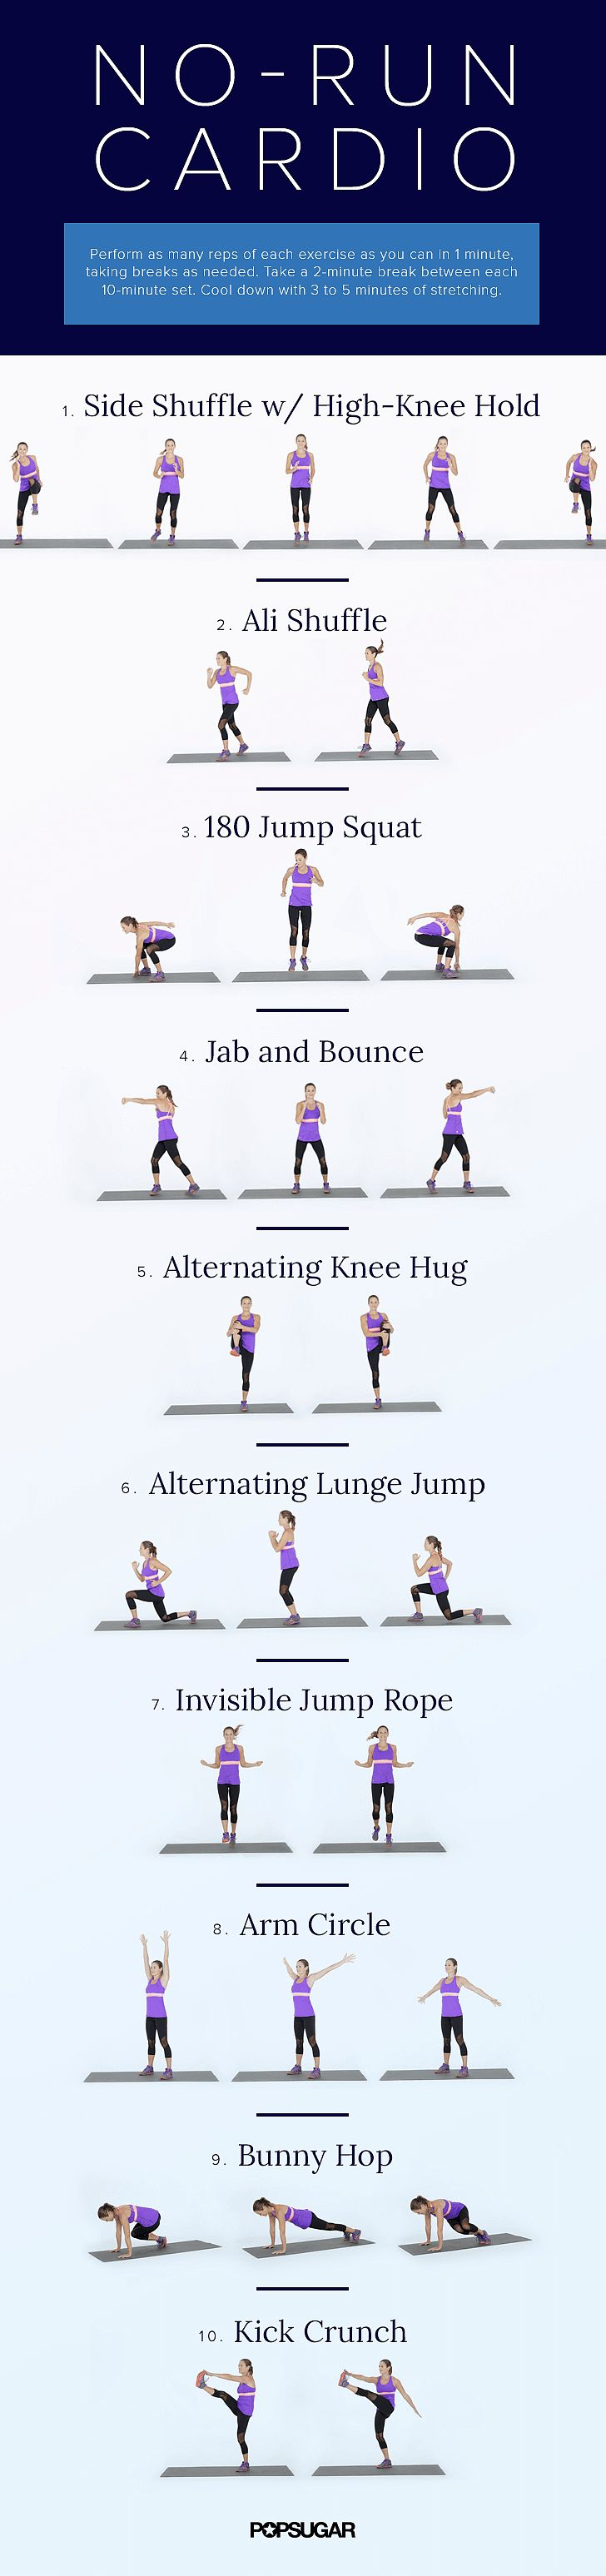 Burn Serious Calories With This No-Run Cardio Workout